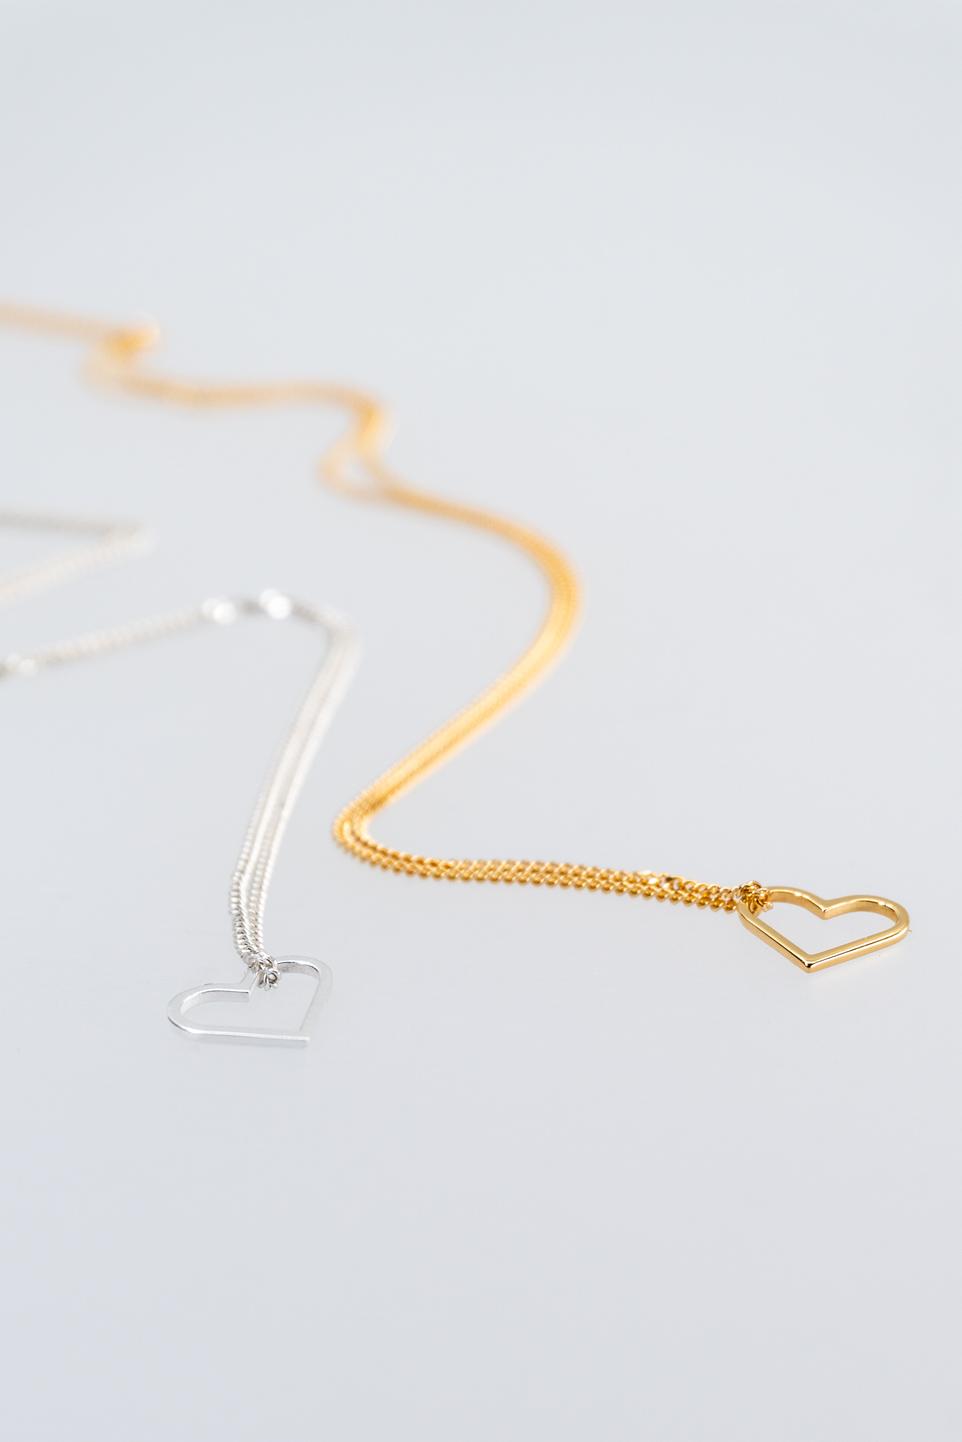 necklace_love_gold-and-silver_jasminajovy-1